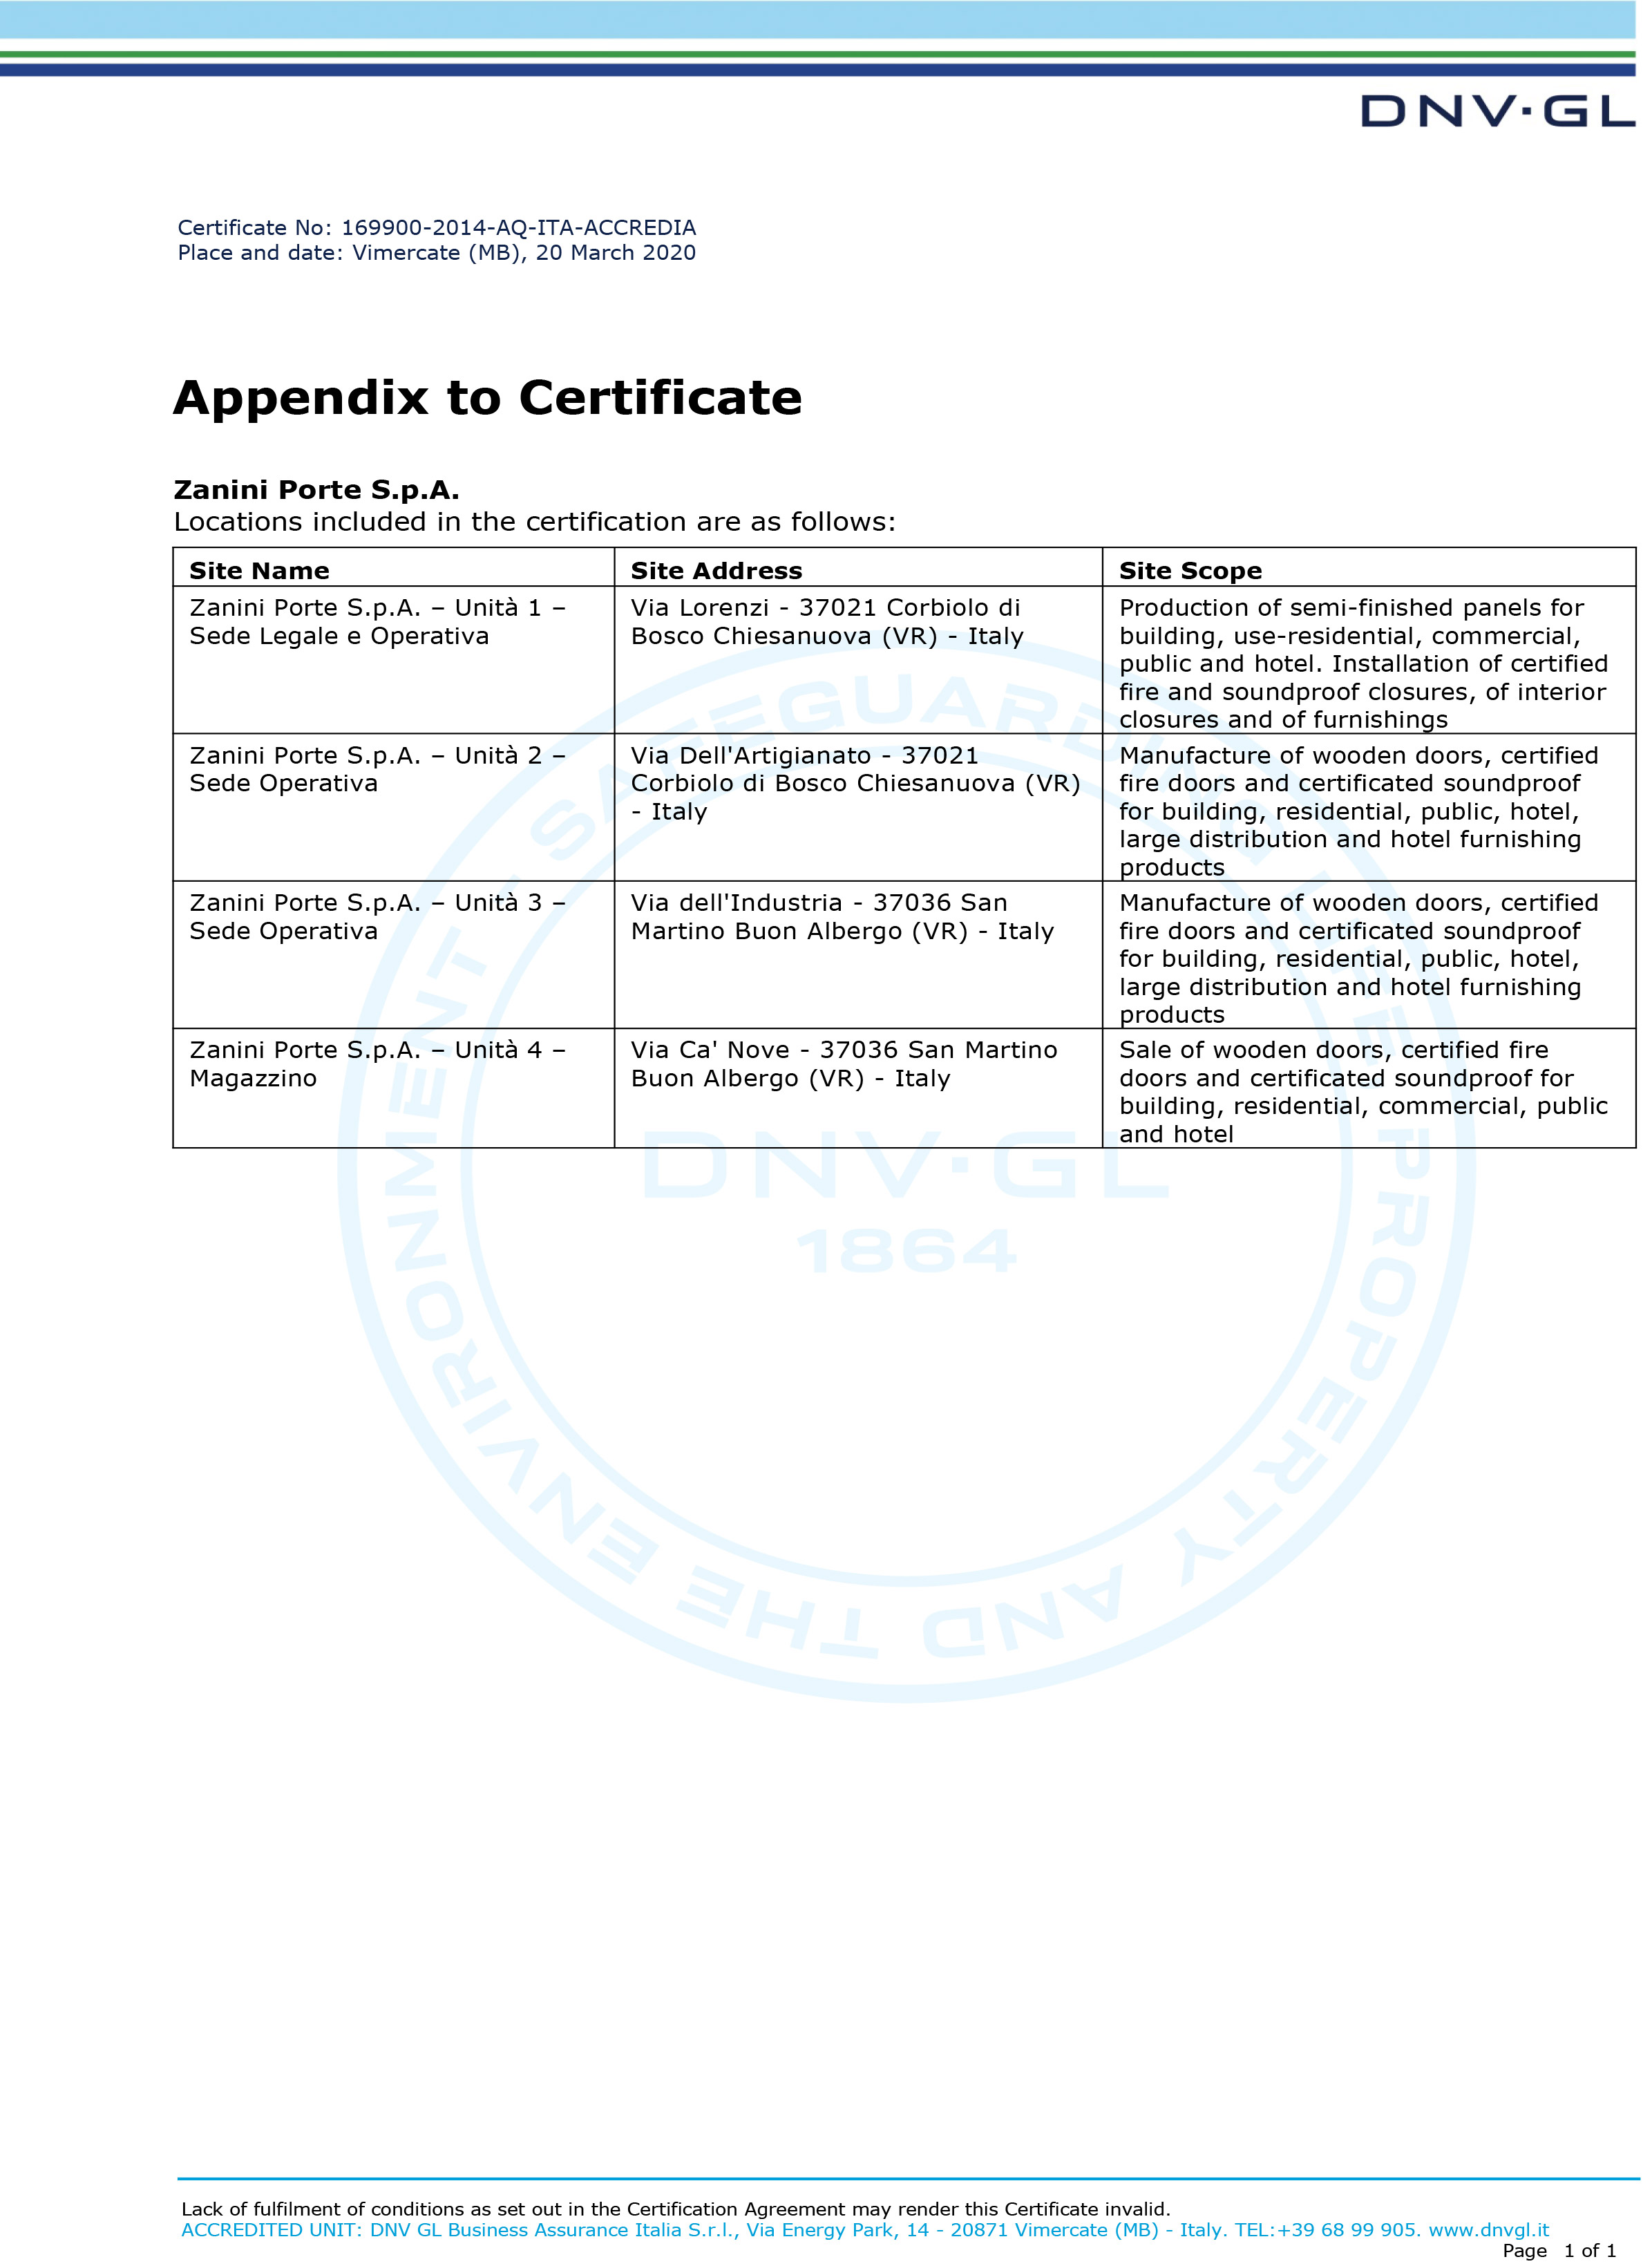 ZANINI-PORTE-S.p.A. ISO 9001 ENG